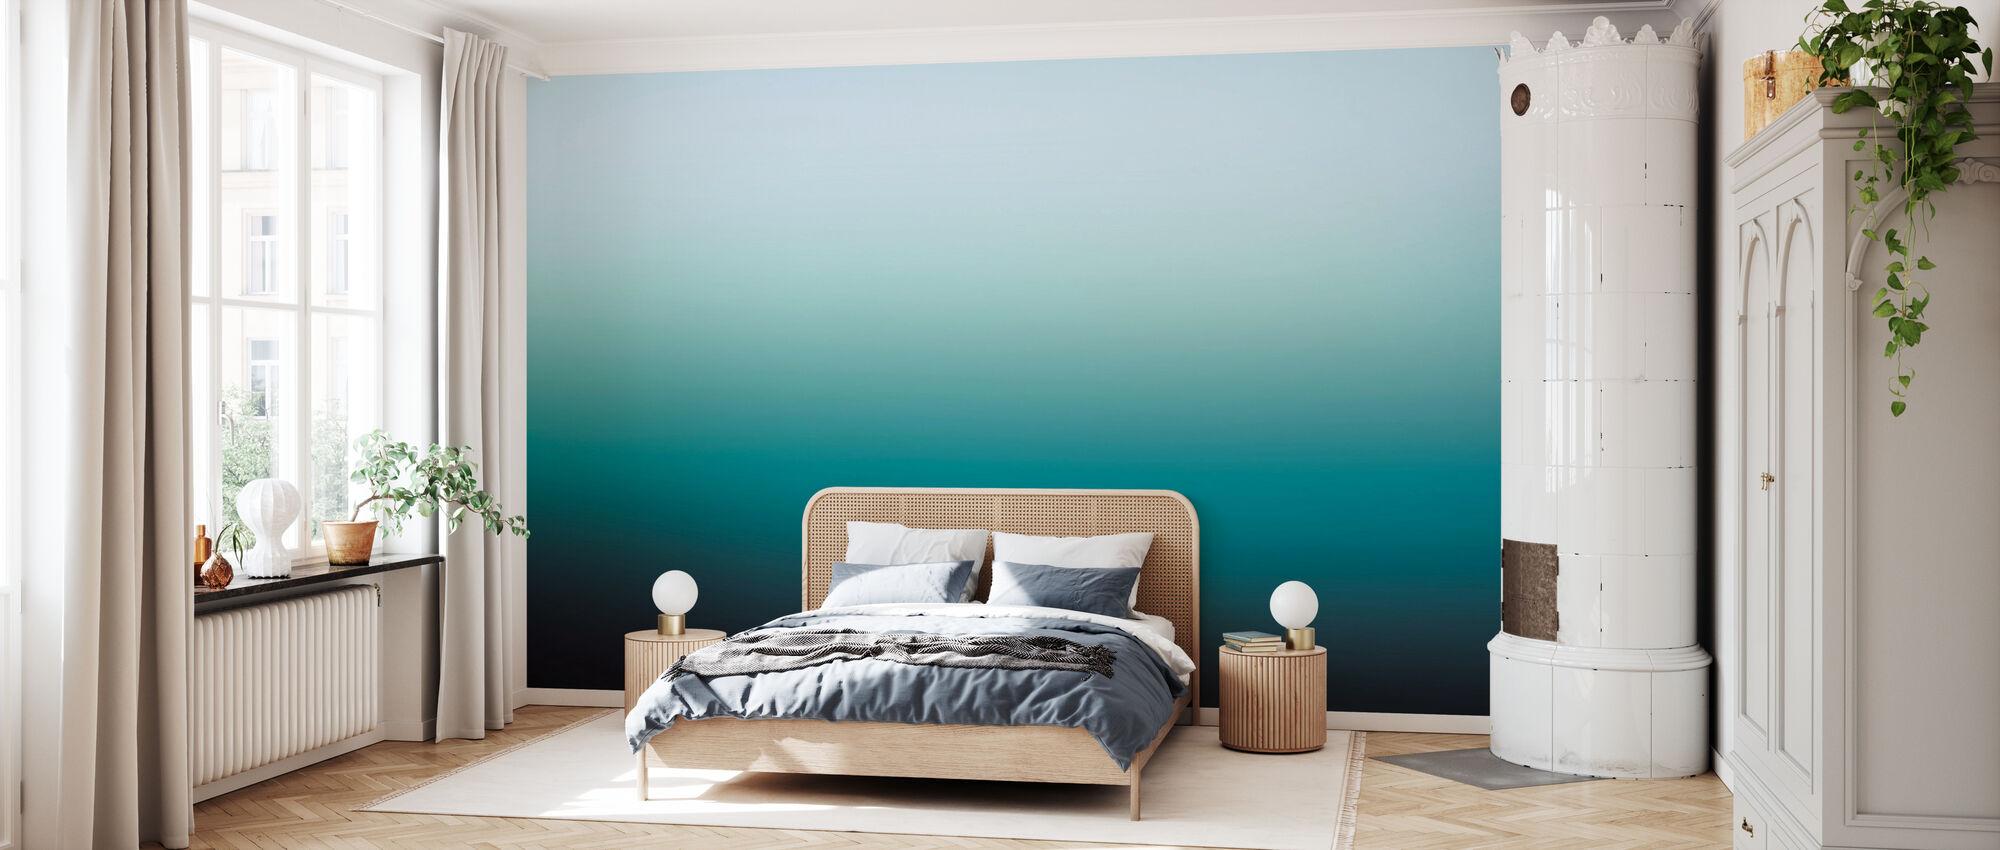 Miami Emeraude - Papier peint - Chambre